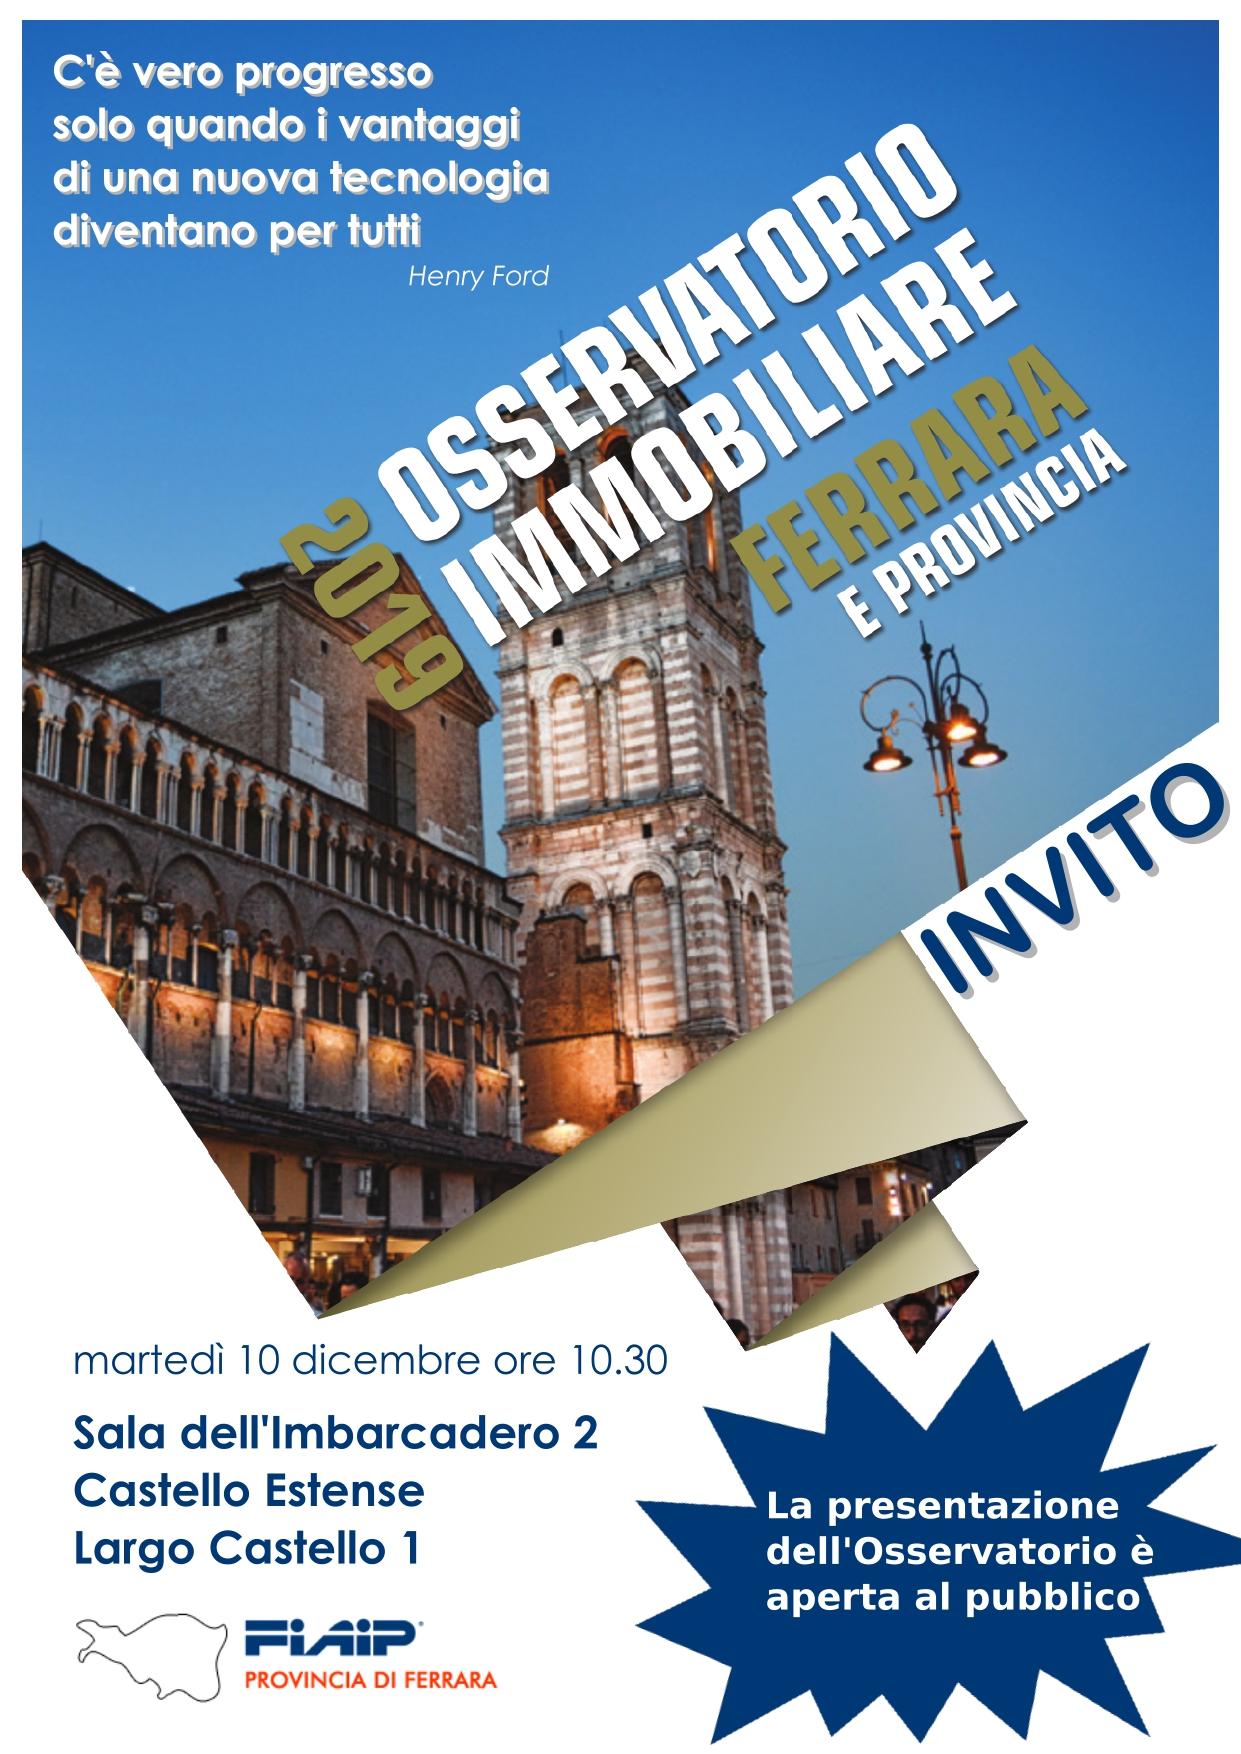 A Ferrara Fiaip presenta l'Osservatorio Immobiliare 2019